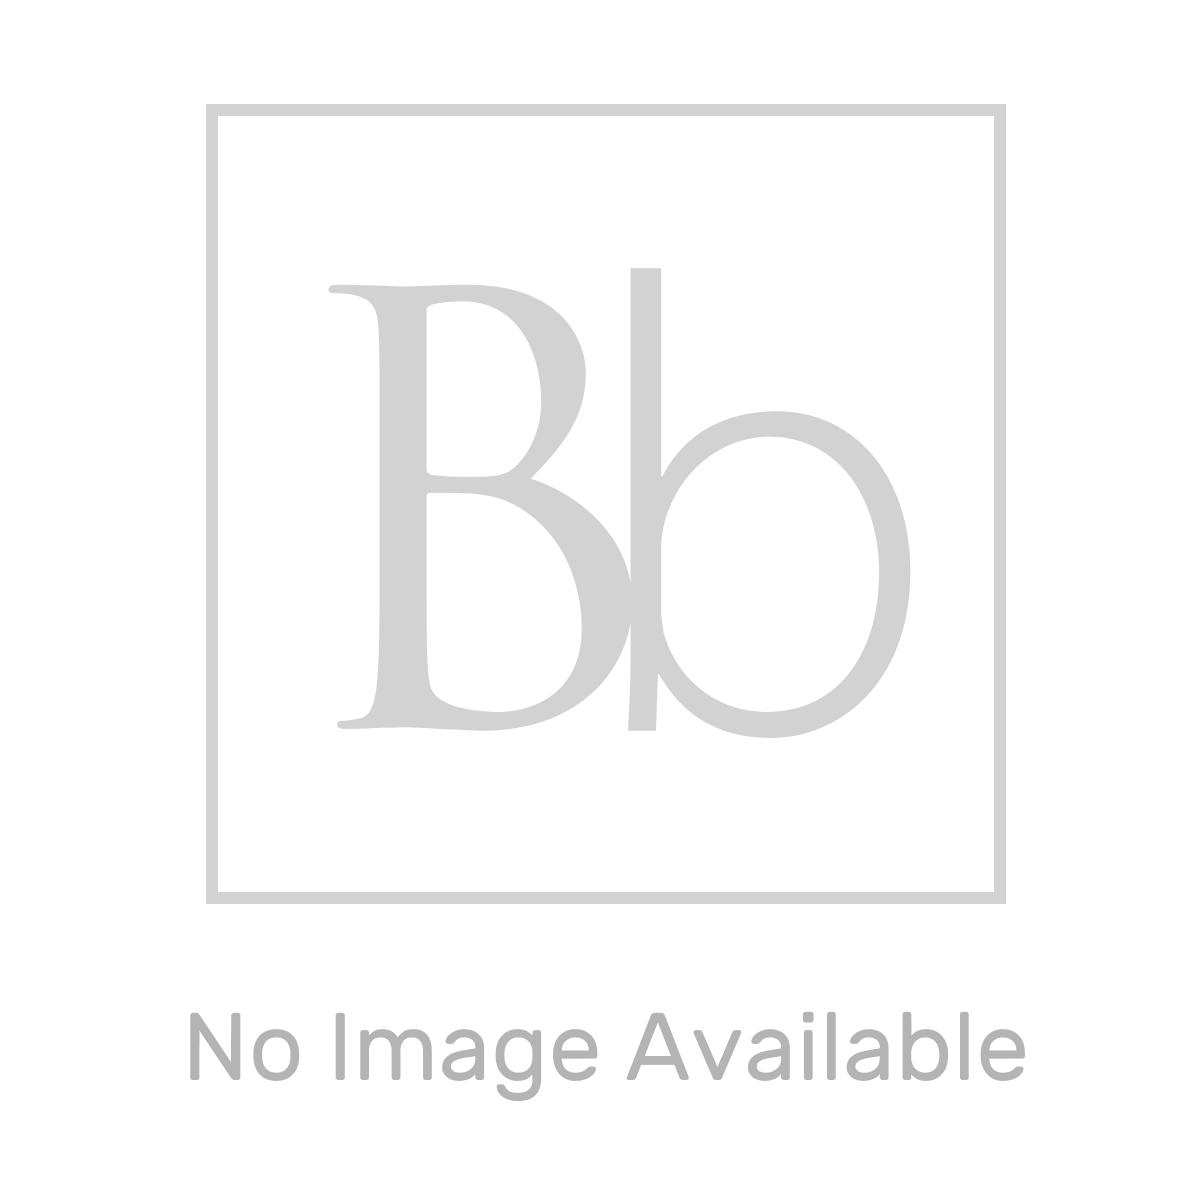 Elation Combination Straight Indigo Matt Furniture Pack 1000mm Left Hand with Brearton Toilet